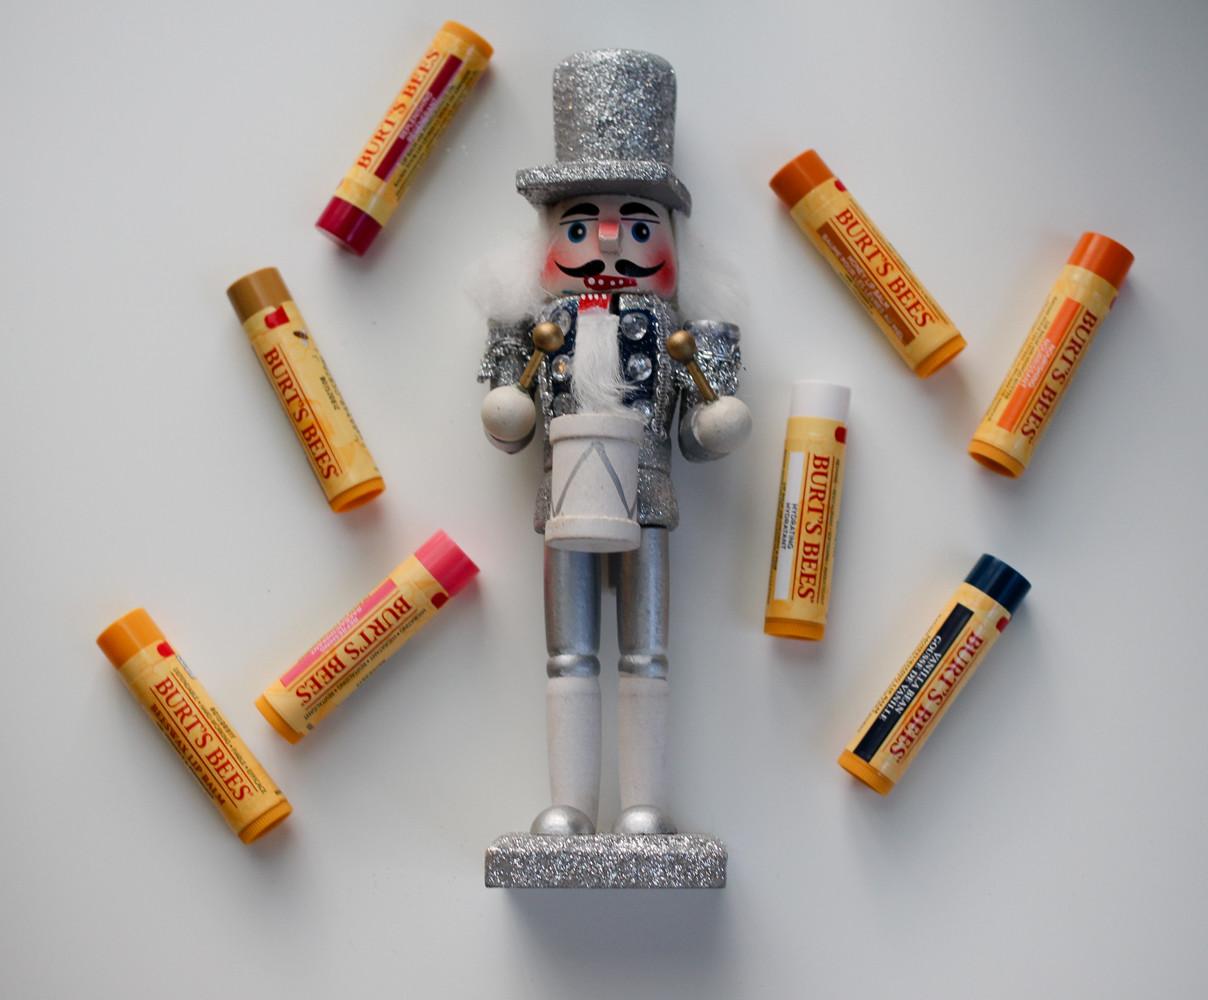 #UncapFlavour with Burt's Bees lip balm